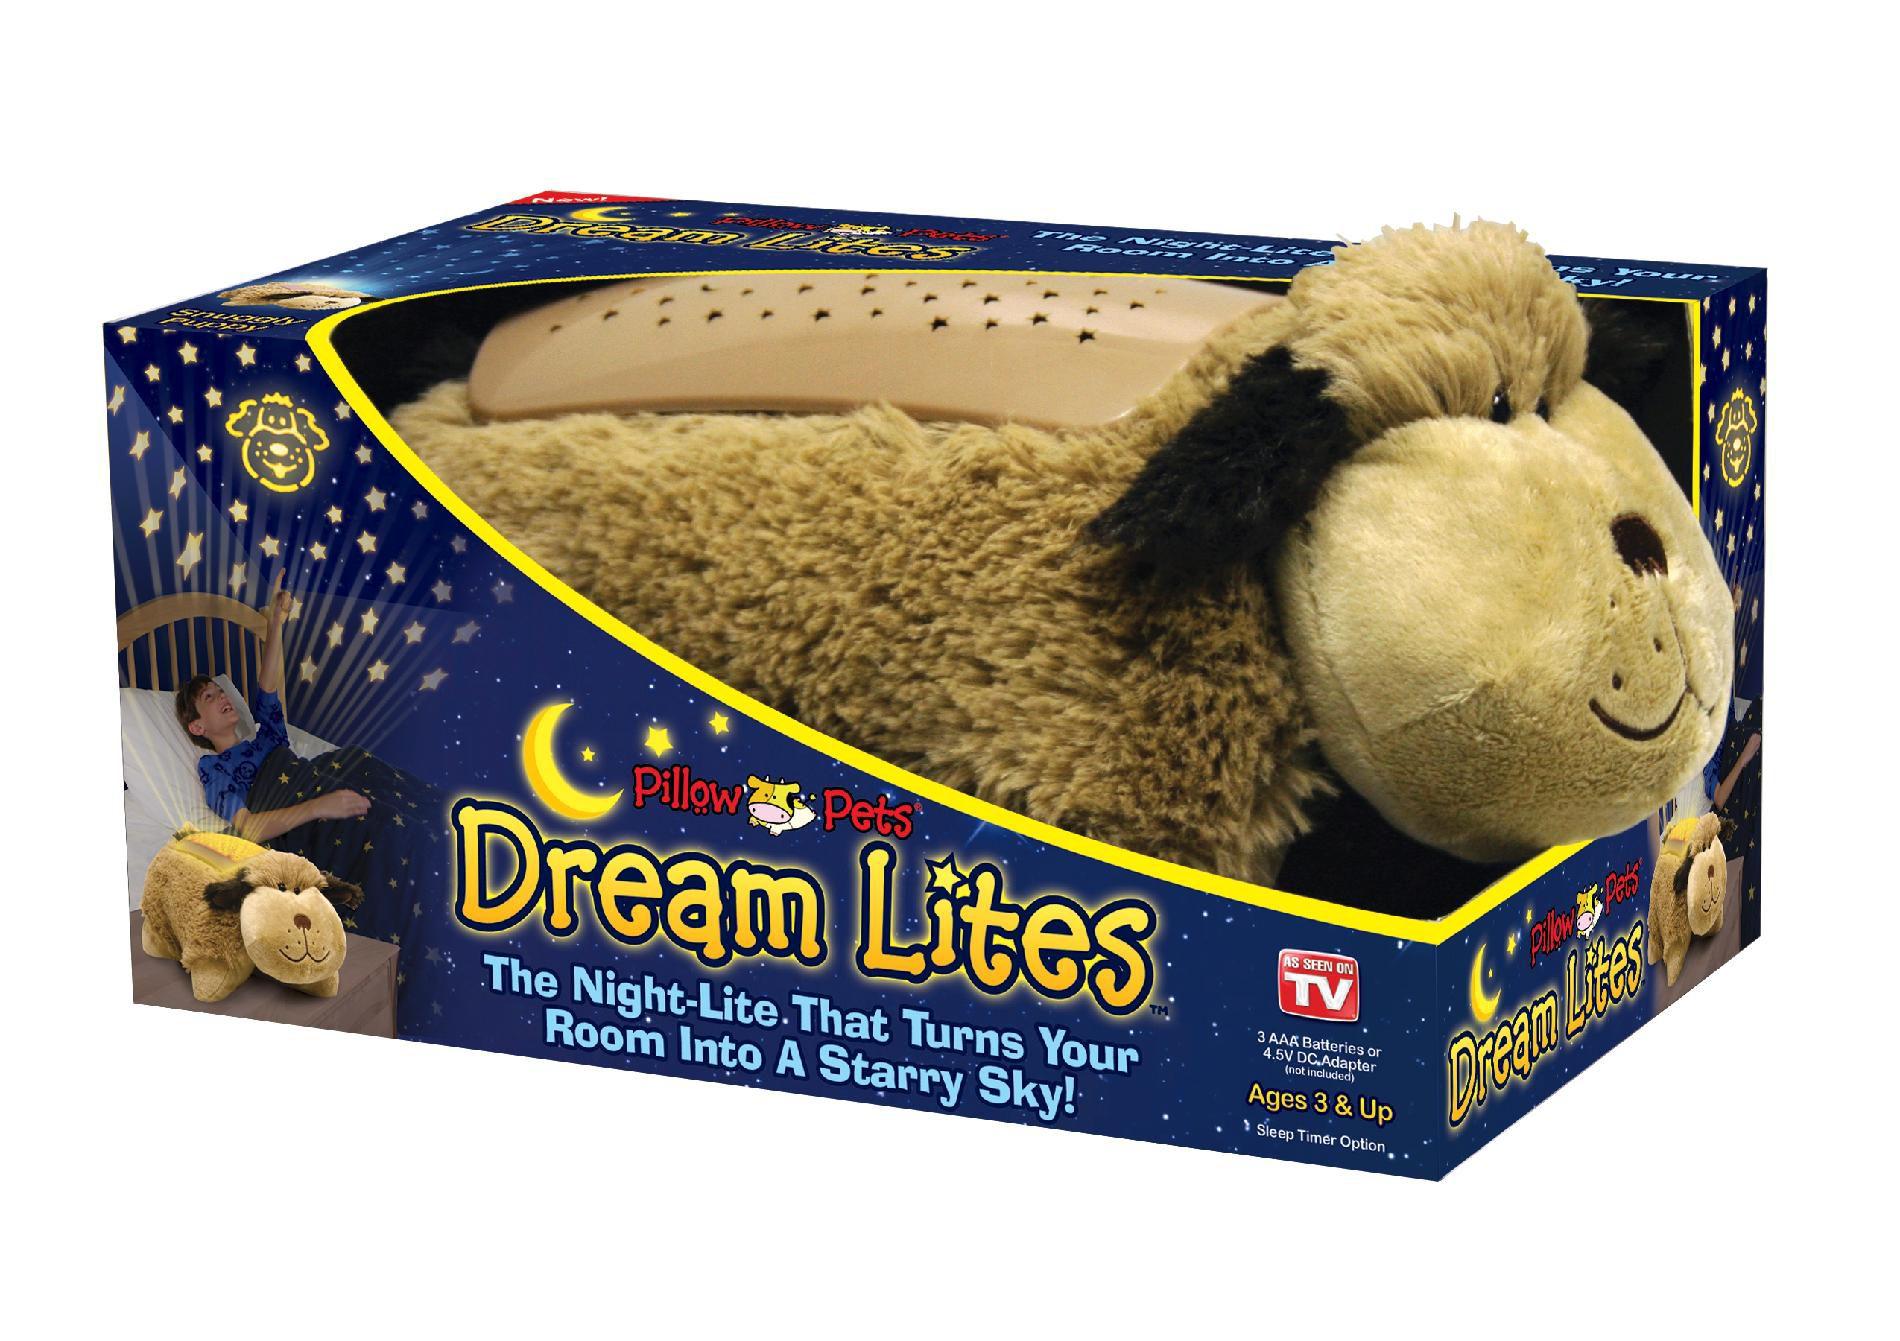 Pillow Pet Dream Lites: A Snuggly Nightlight for Children